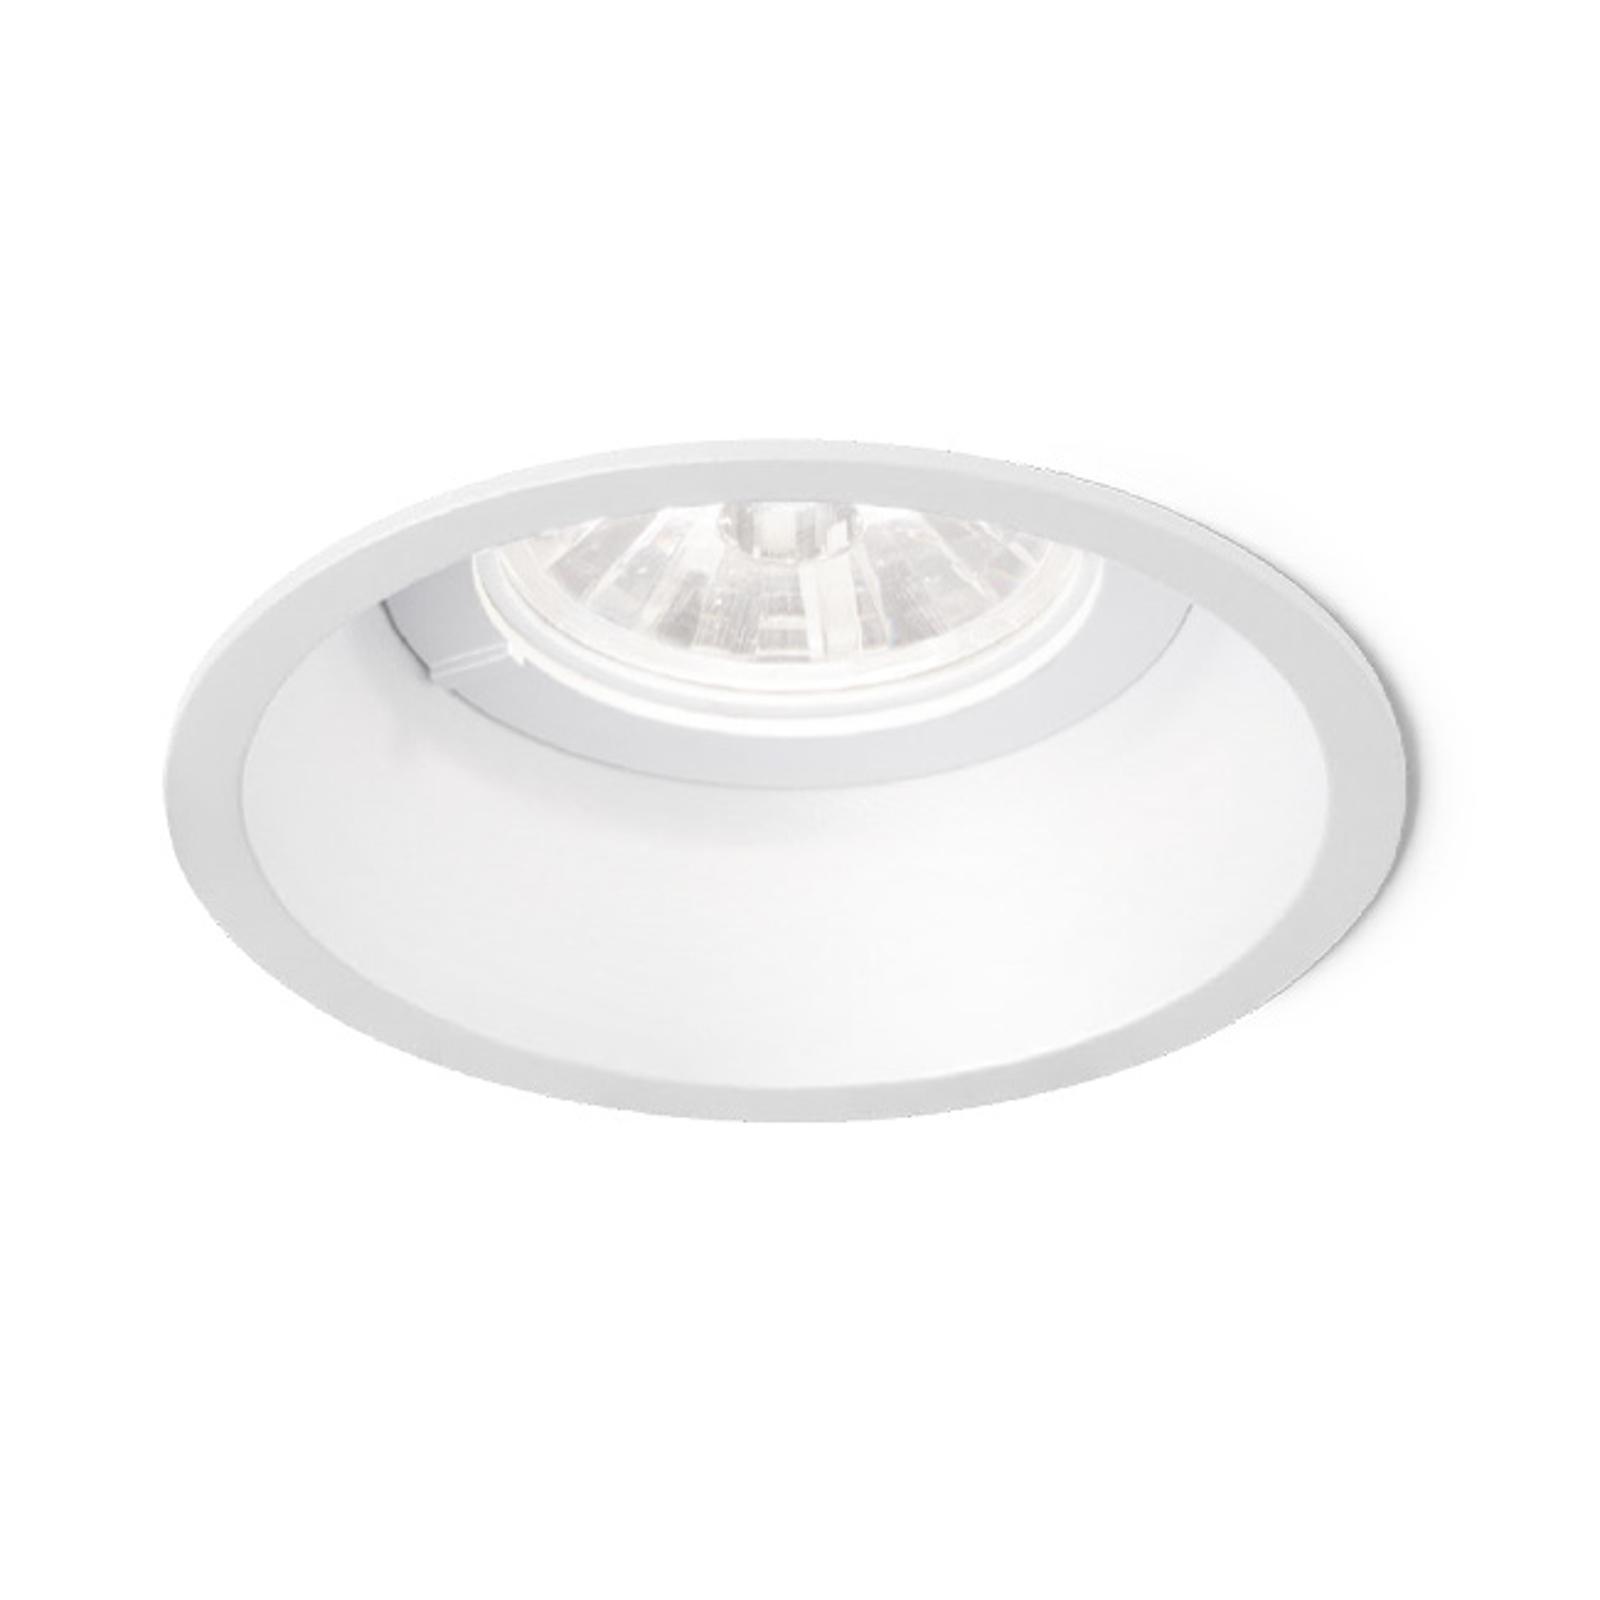 WEVER & DUCRÉ Deep 1.0 inbouwlamp 2.700K wit